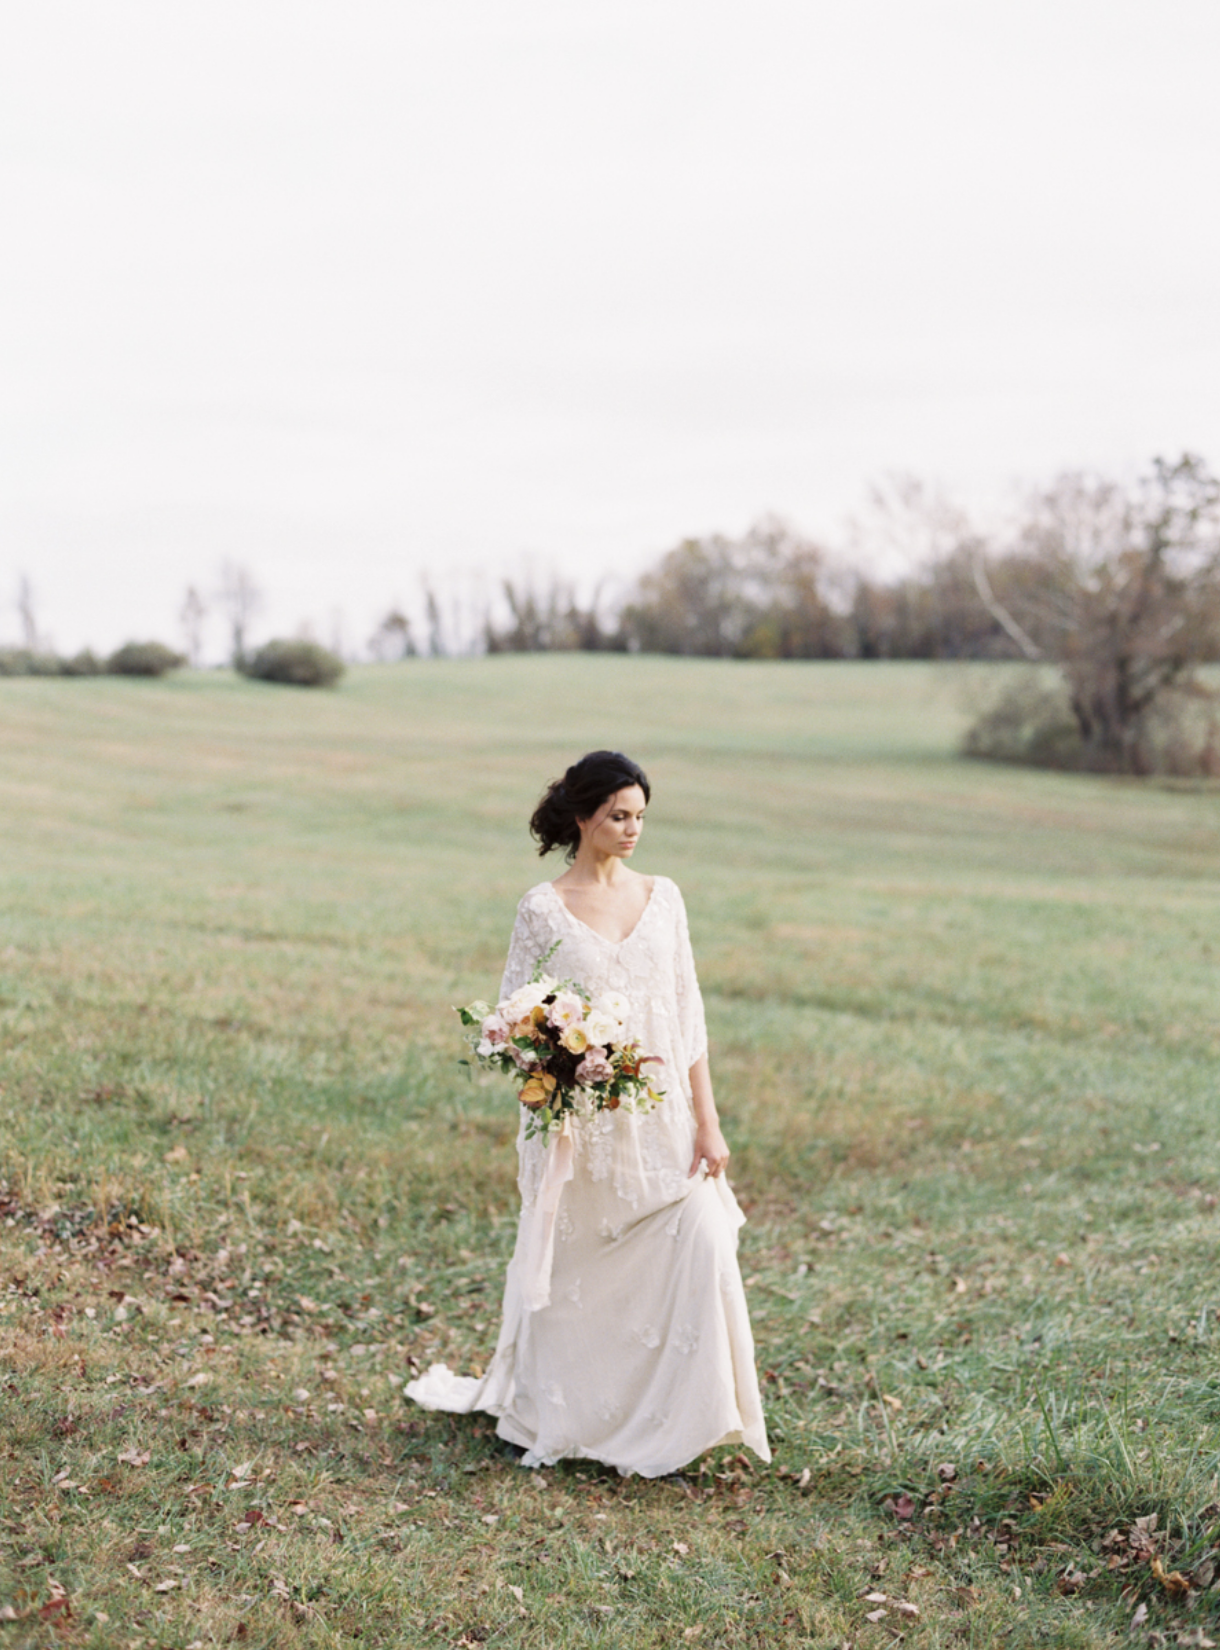 Carol Hannah Bridal Iolite Gown Shanon Moffit Photography 6.png